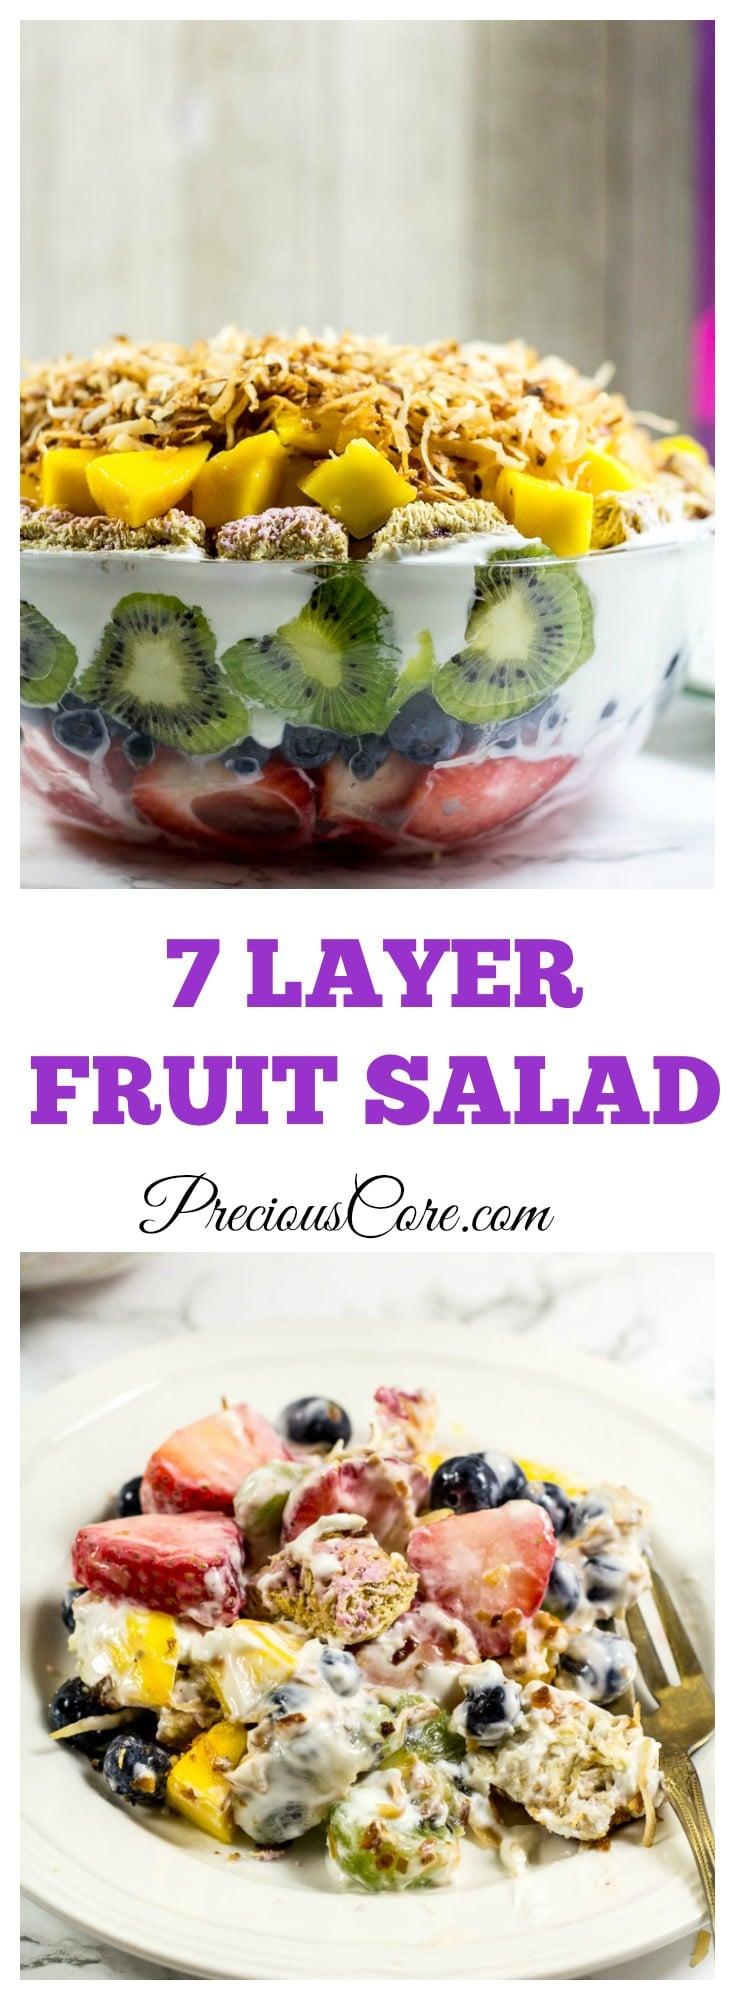 7 Layer Fruit Salad - Precious Core